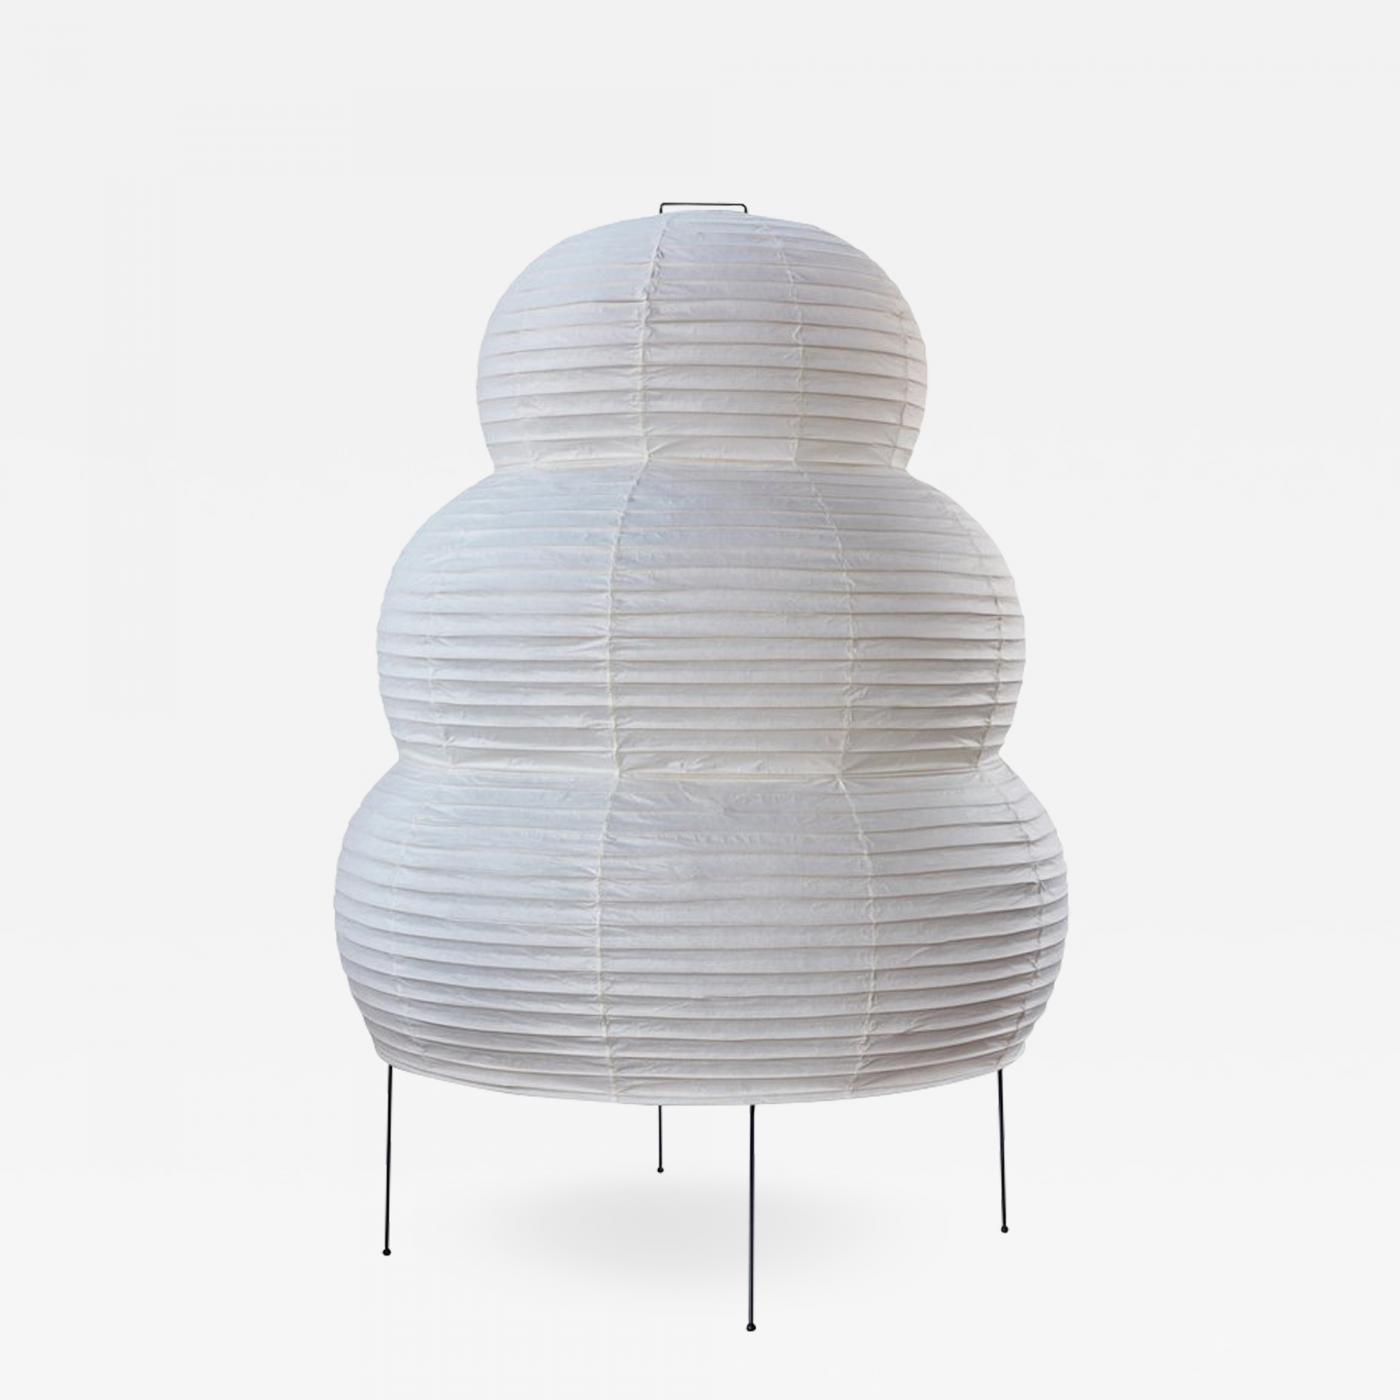 Akari furniture Designer Salary Large Isamu Noguchi Akari 25n Floor Lamp Incollect Isamu Noguchi Large Isamu Noguchi Akari 25n Floor Lamp